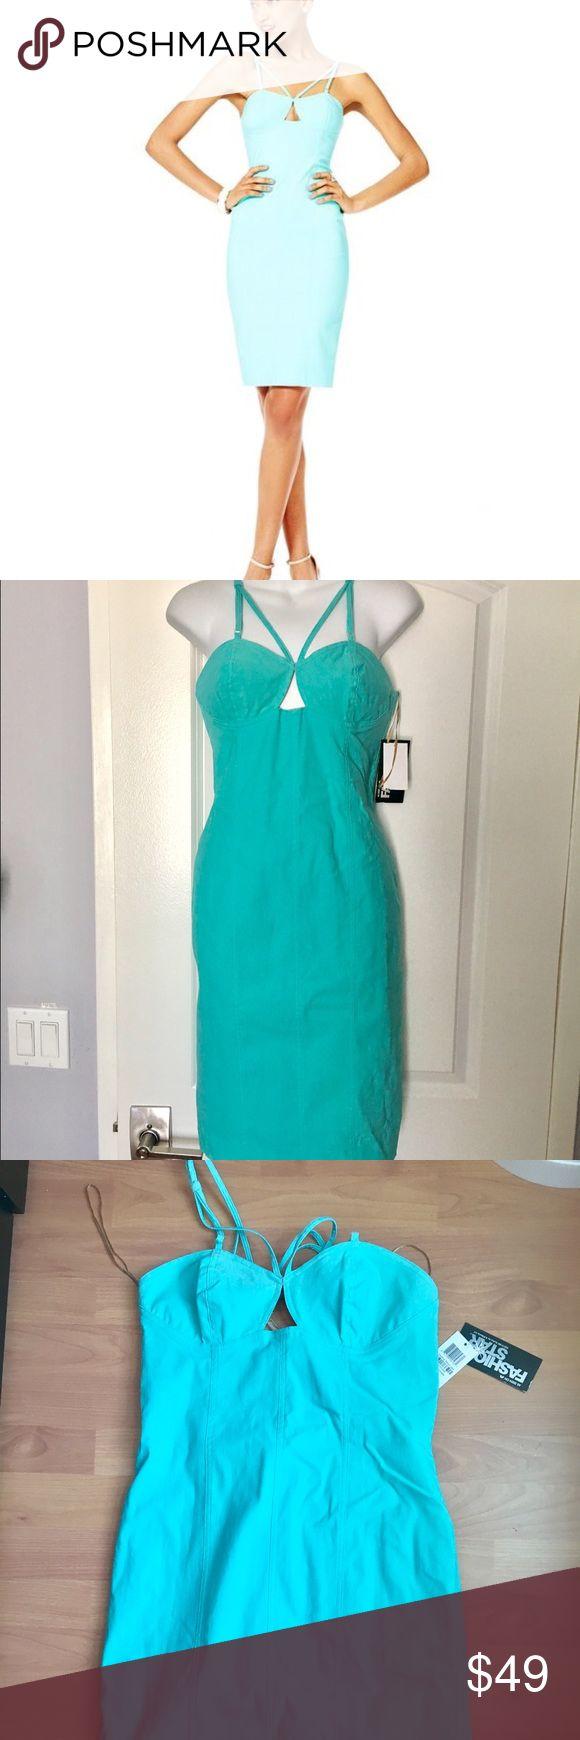 Fashion stars for Macy's aqua green dress New, 6 New with tags aqua color dress by Fashion Stars for Macy's. Size 6 .     item # 043 fashion stars  Dresses Midi